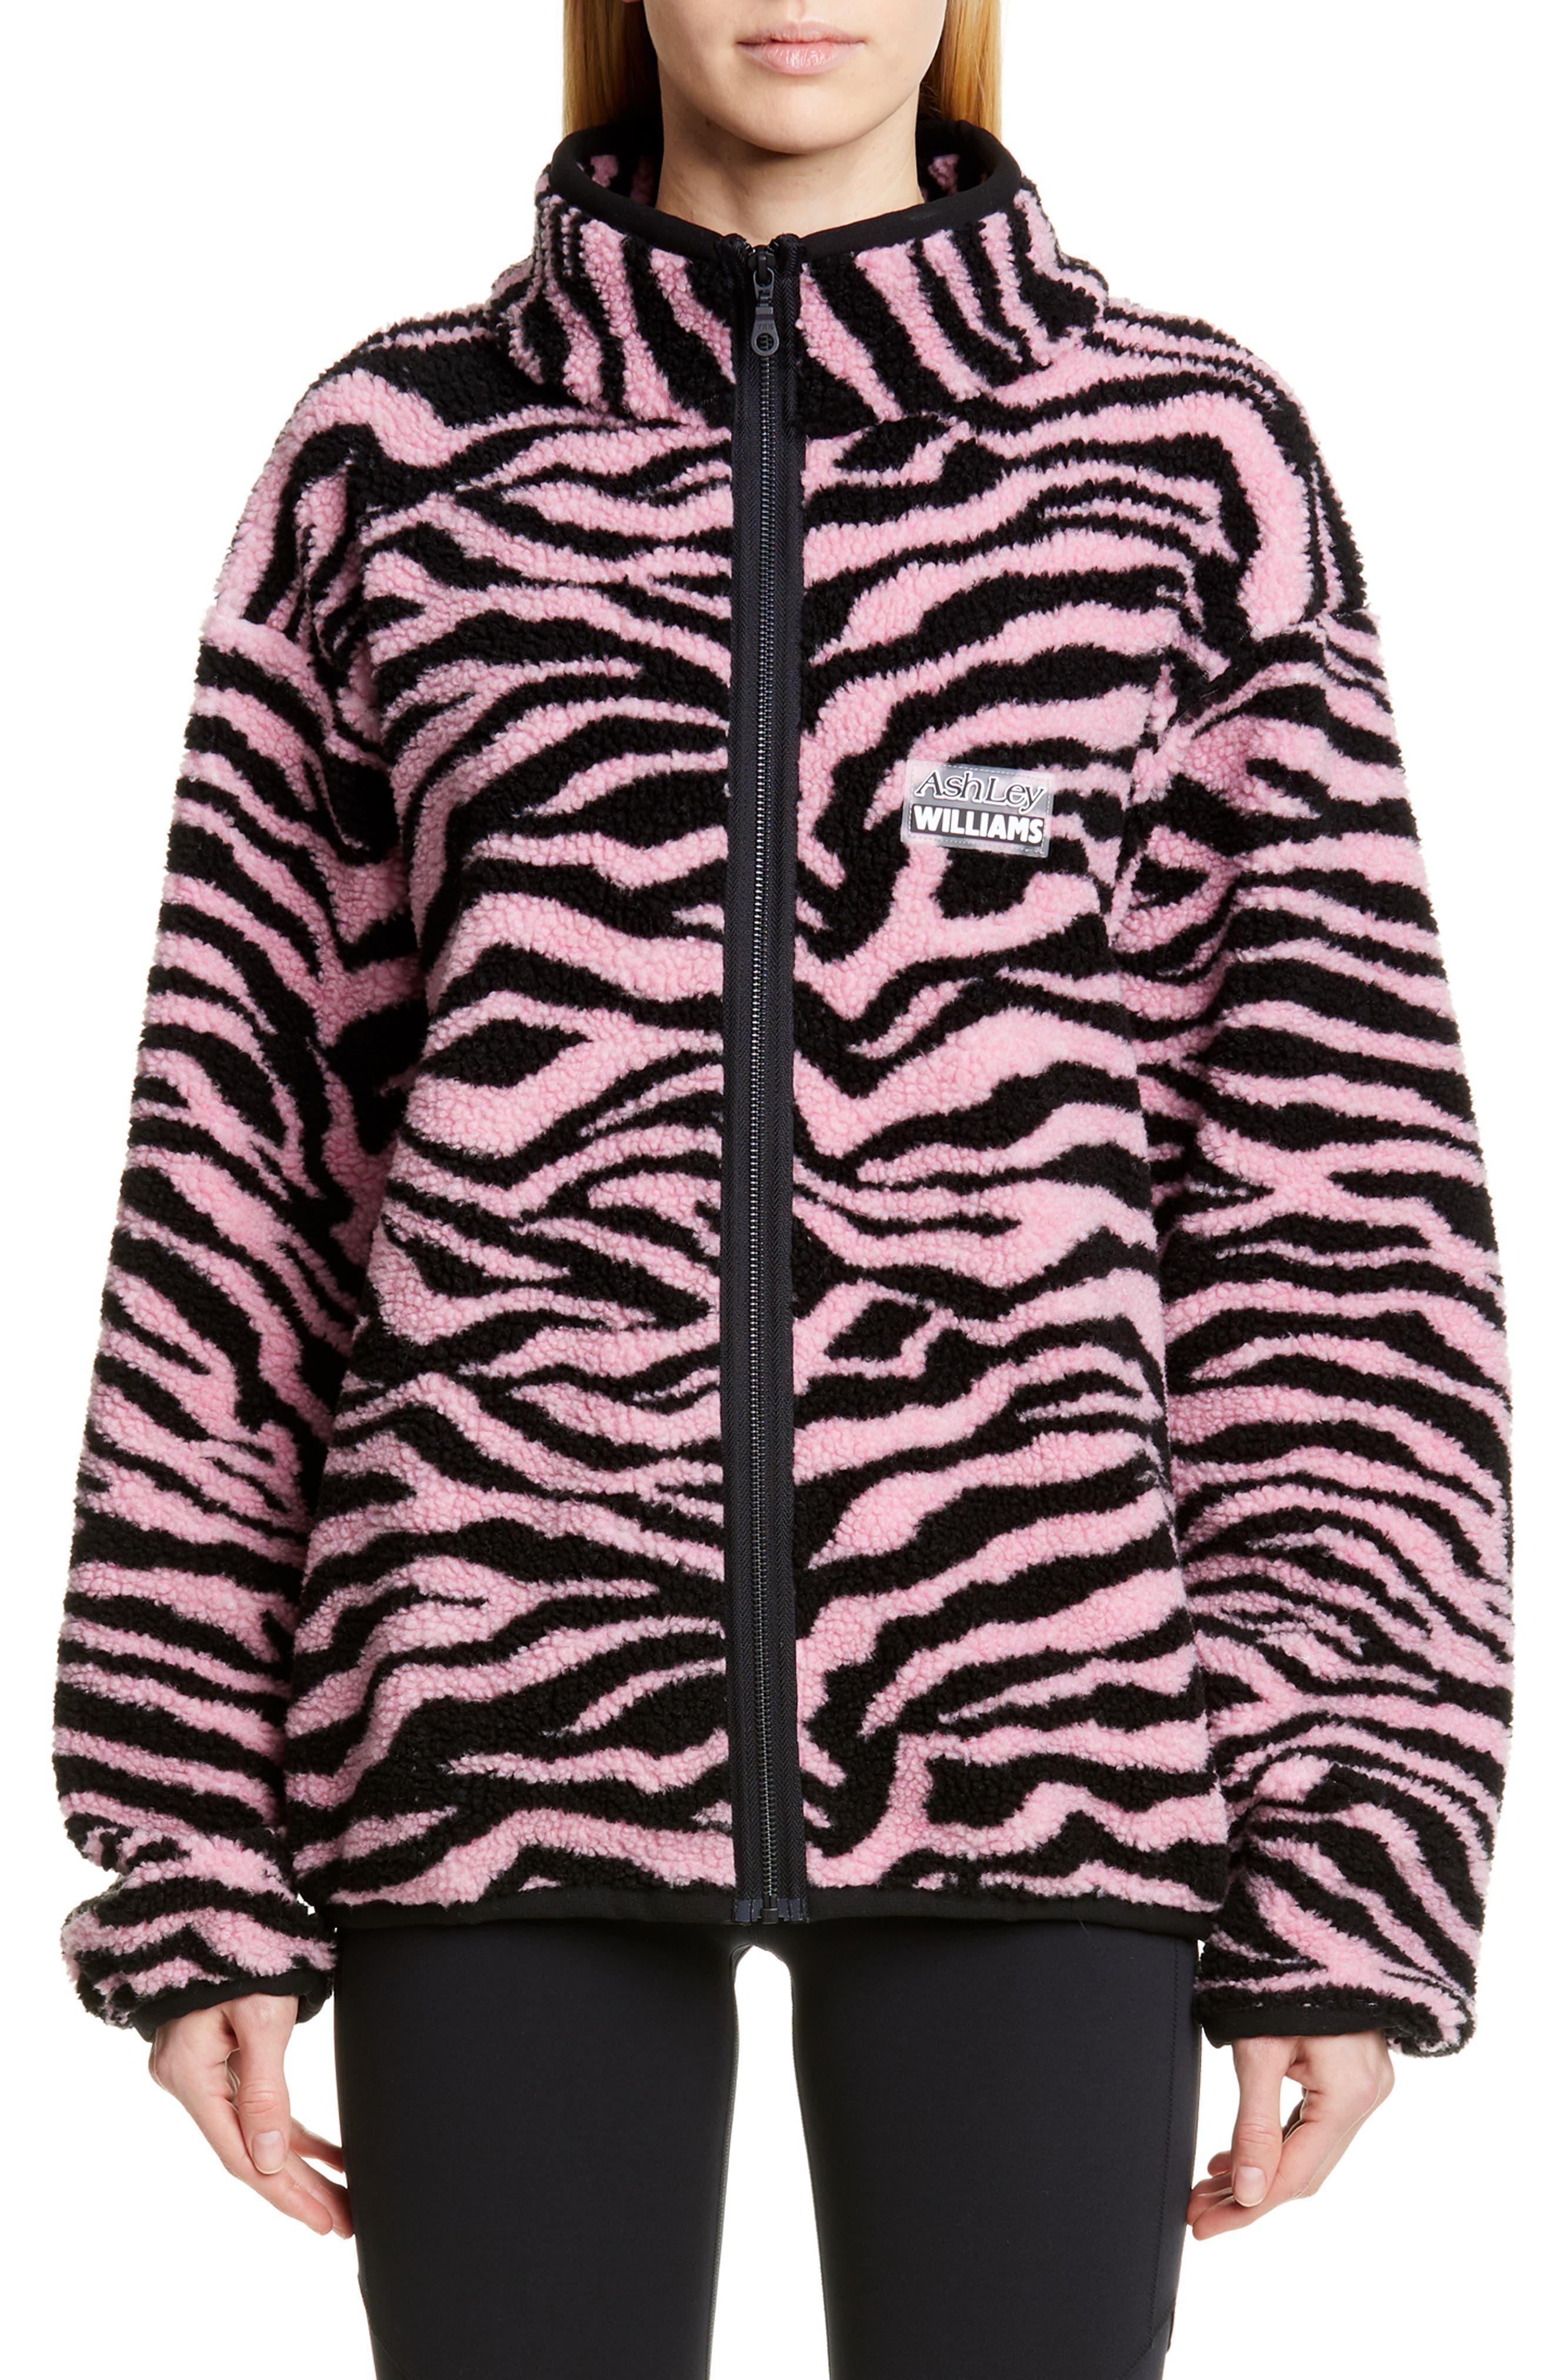 Ashley Williams Juju Tiger Print Fleece Jacket, Pink (Nordstrom Exclusive)